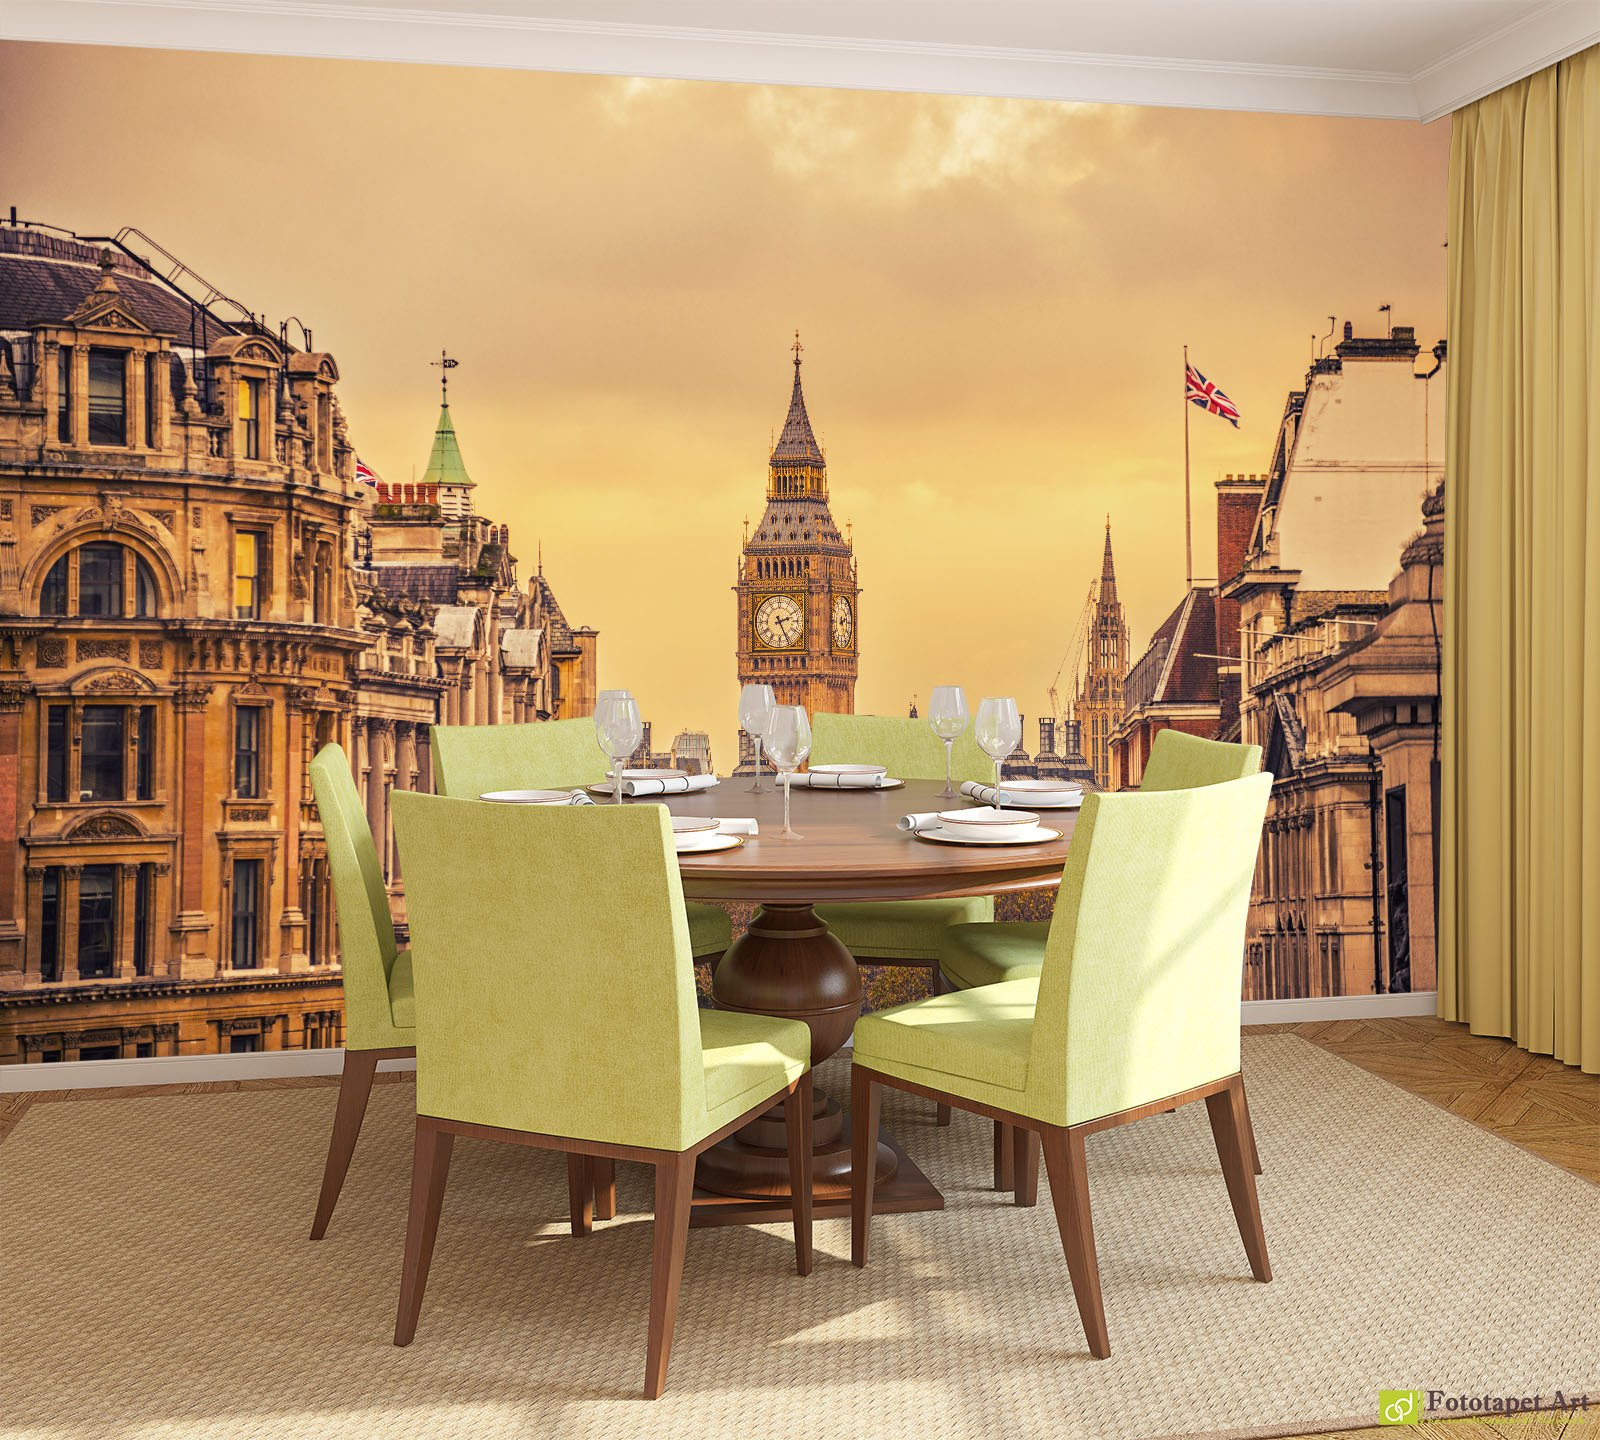 City Wallpaper & Wall Murals - Trafalgar Square, Londra | Fototapet ...